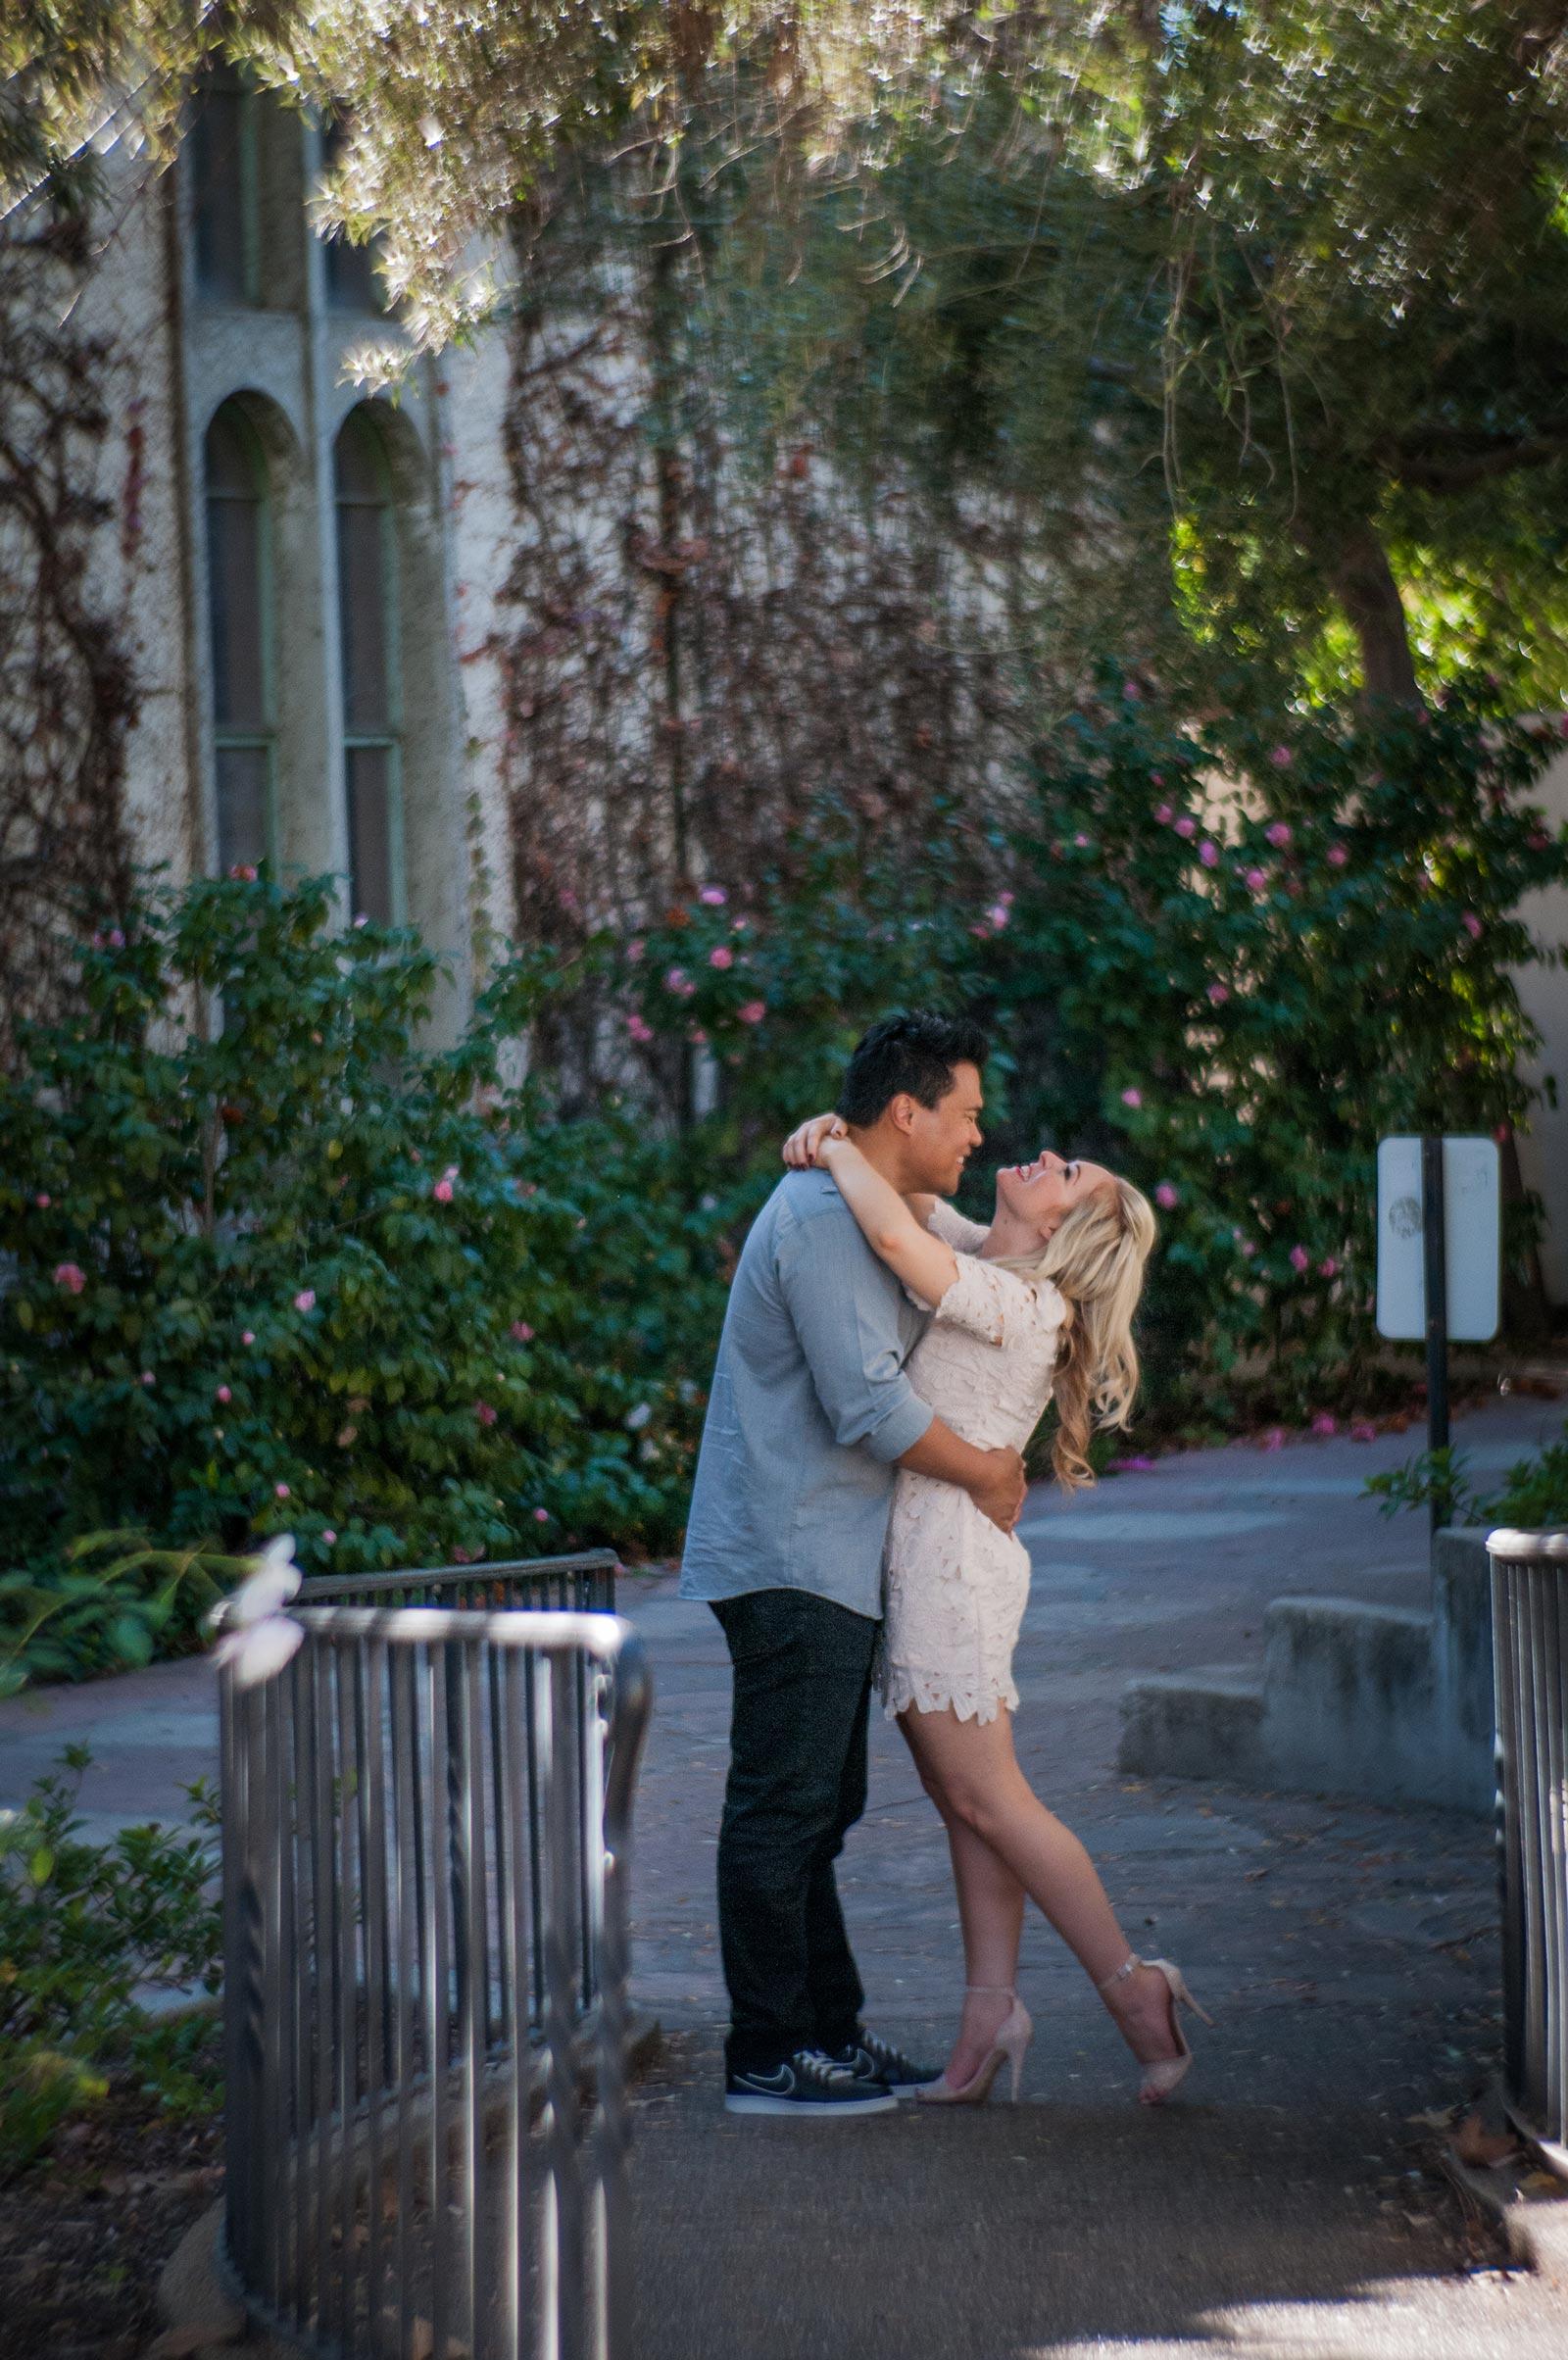 Heather-and-Kaleo---Save-the-Date-19.jpg